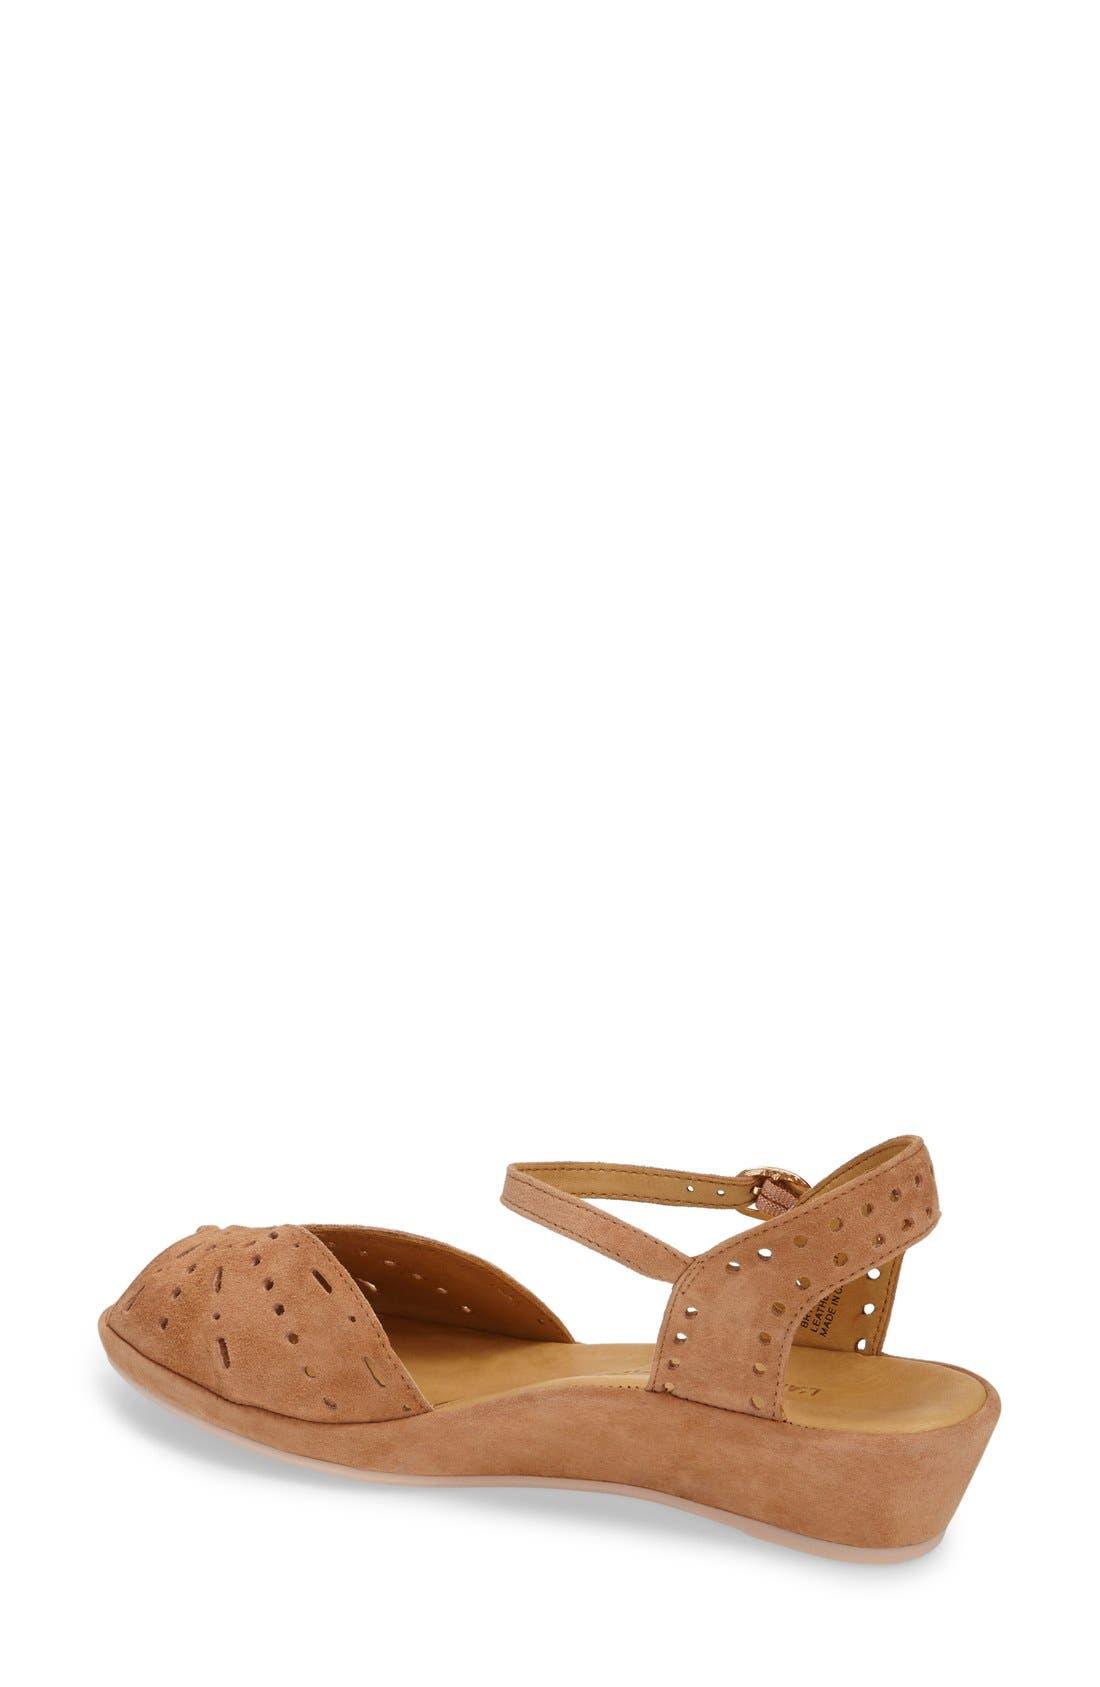 'Brenn' Ankle Strap Sandal,                             Alternate thumbnail 2, color,                             Cognac Suede